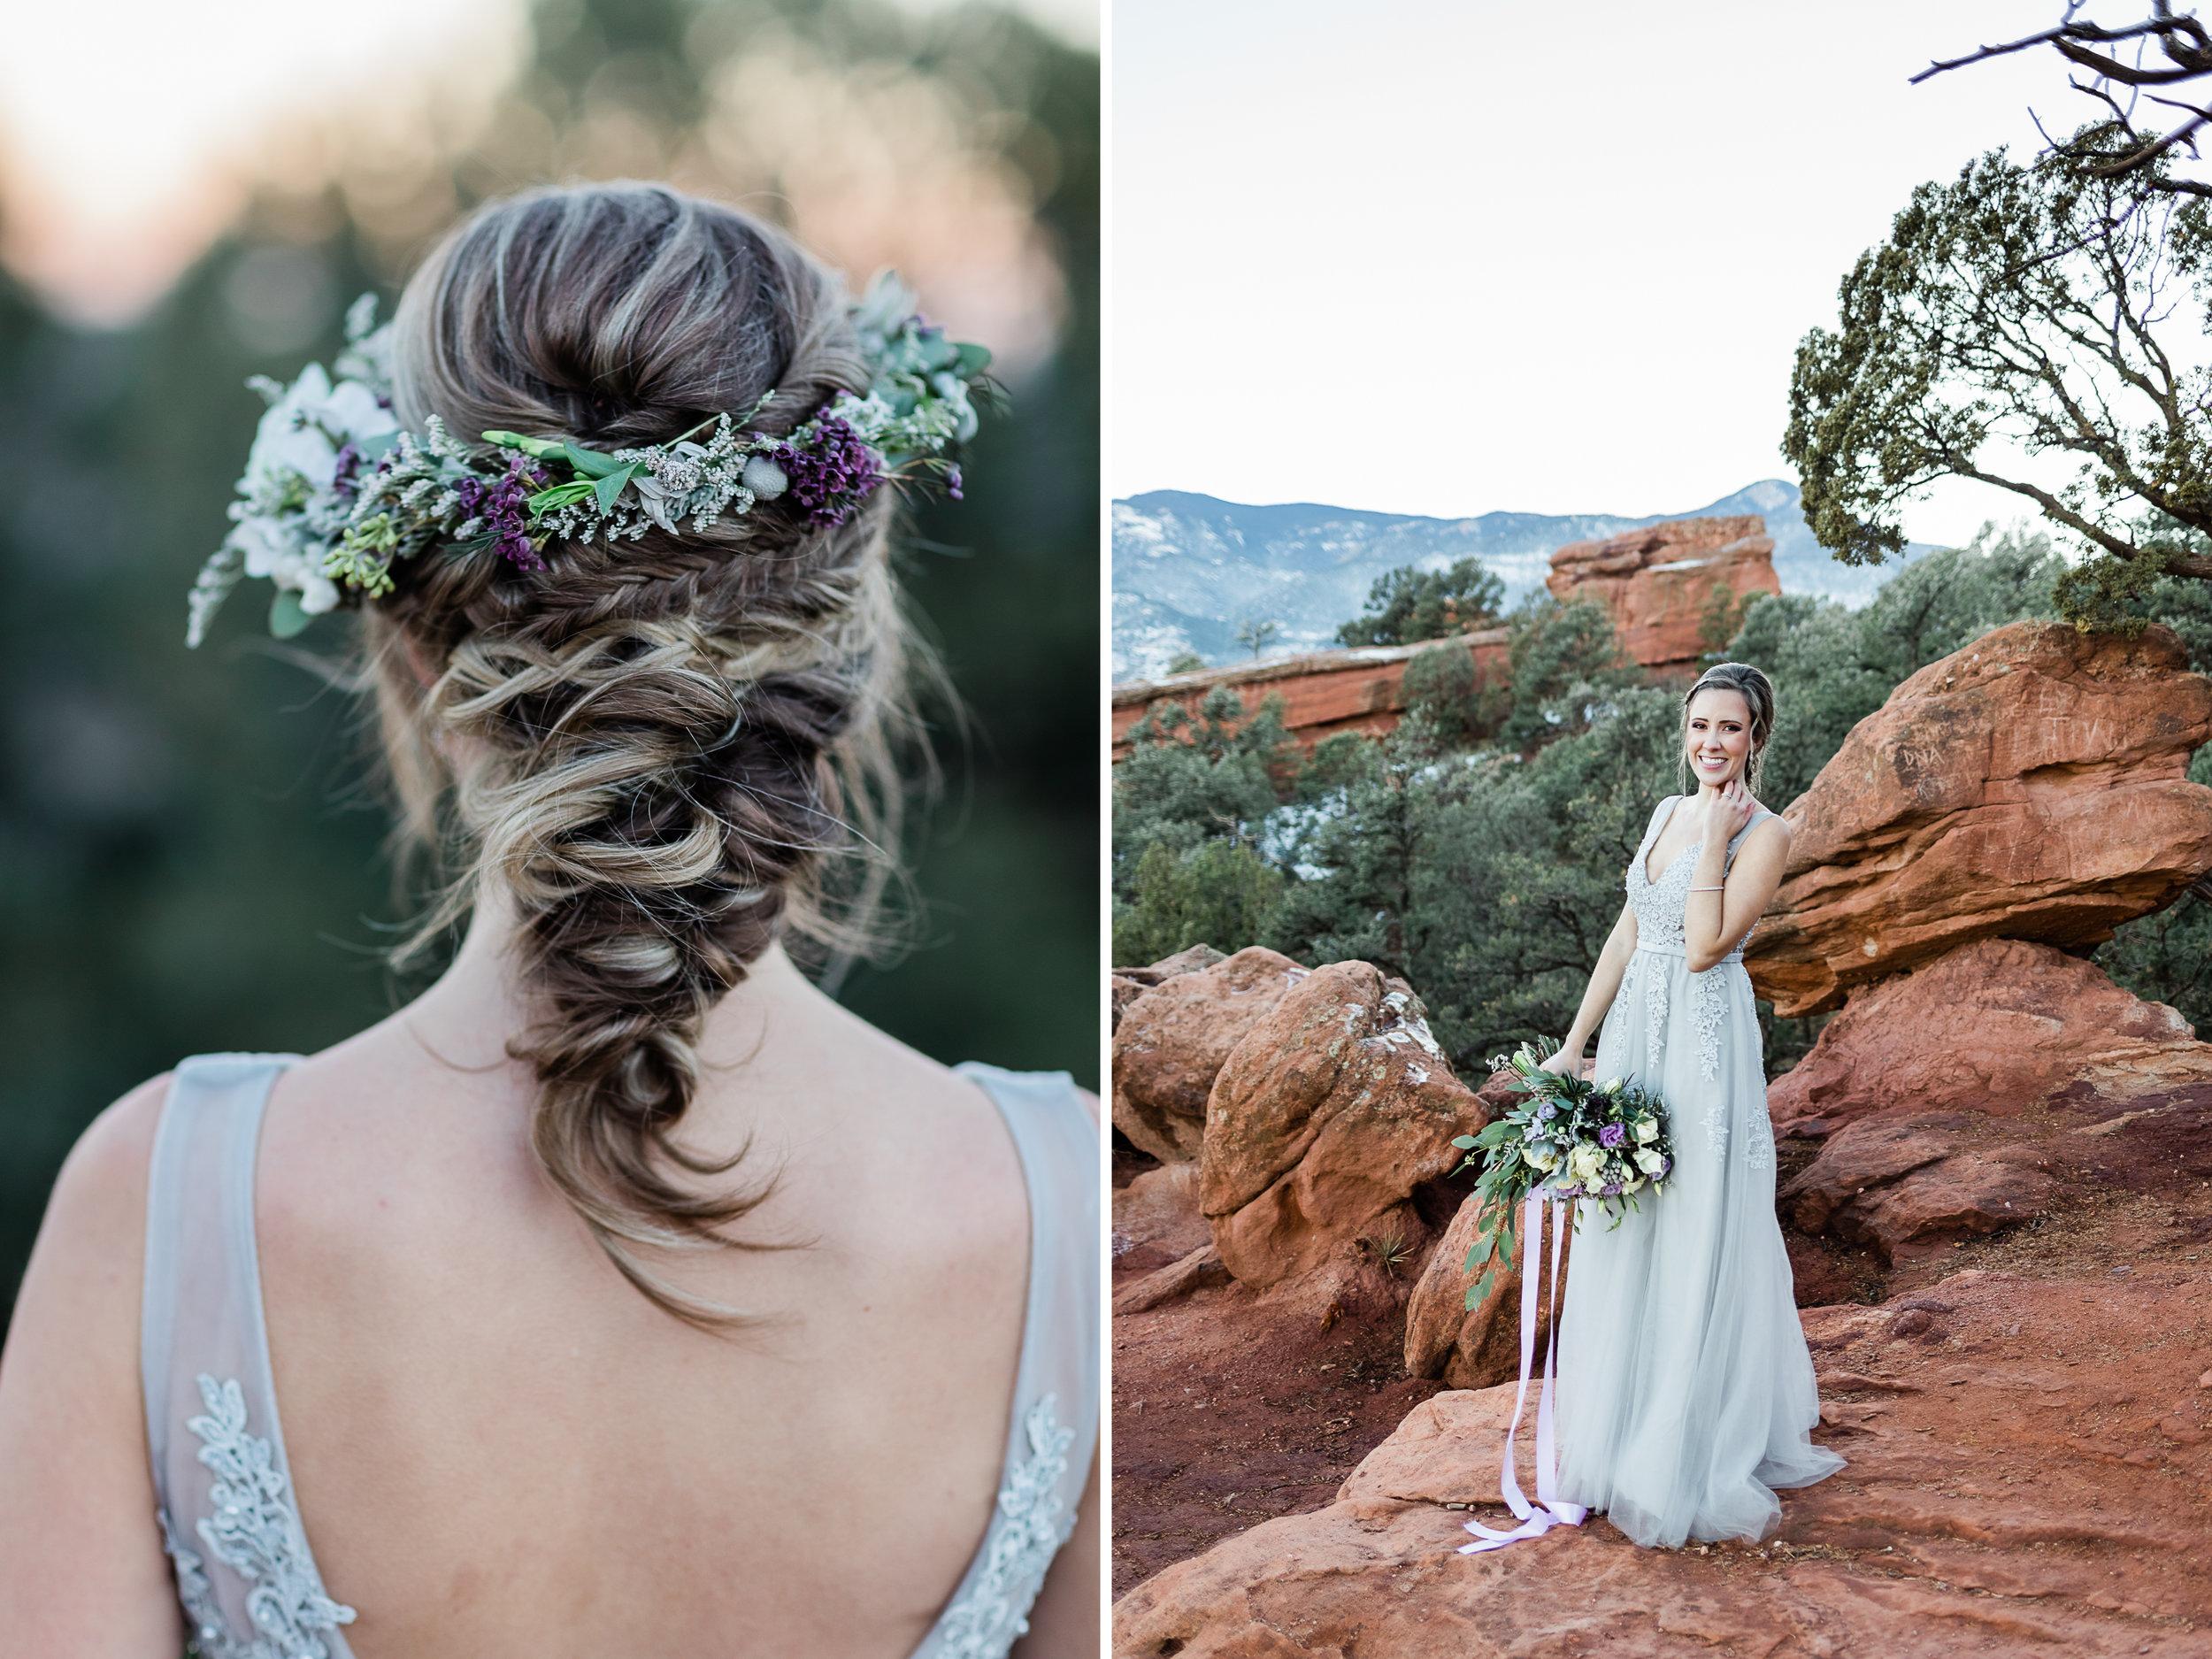 Colorado Springs Wedding Photographer 9.jpg